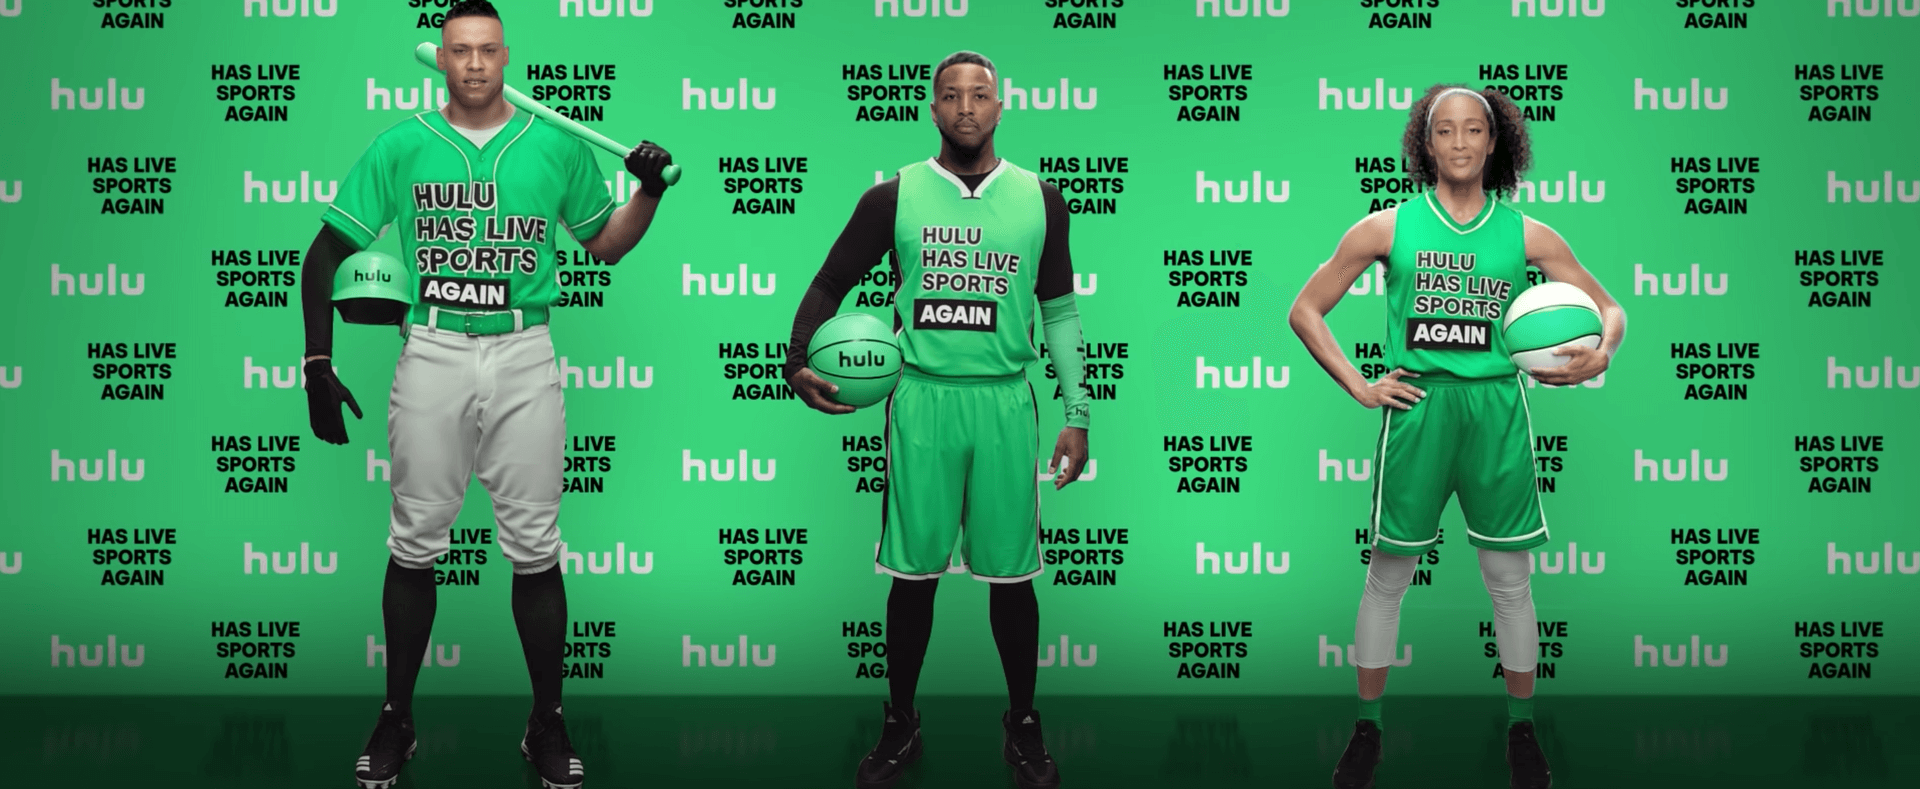 Hulu Has Live Sports Again